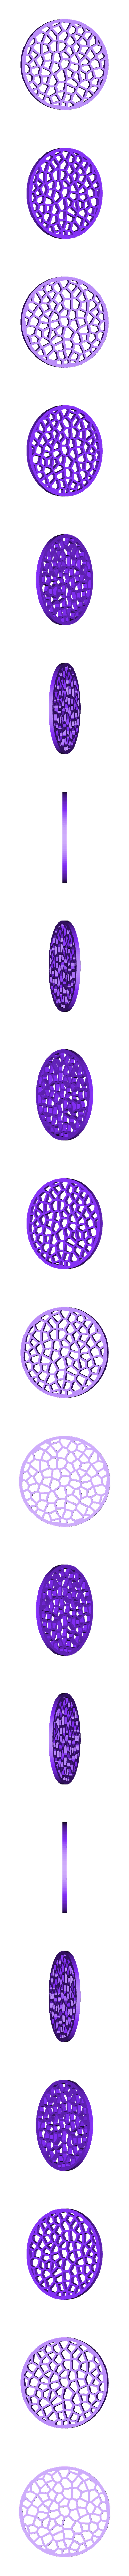 malla_mark1.stl Download free STL file Mask 3D NanoHack 2.0 • 3D printer design, Tonystark112